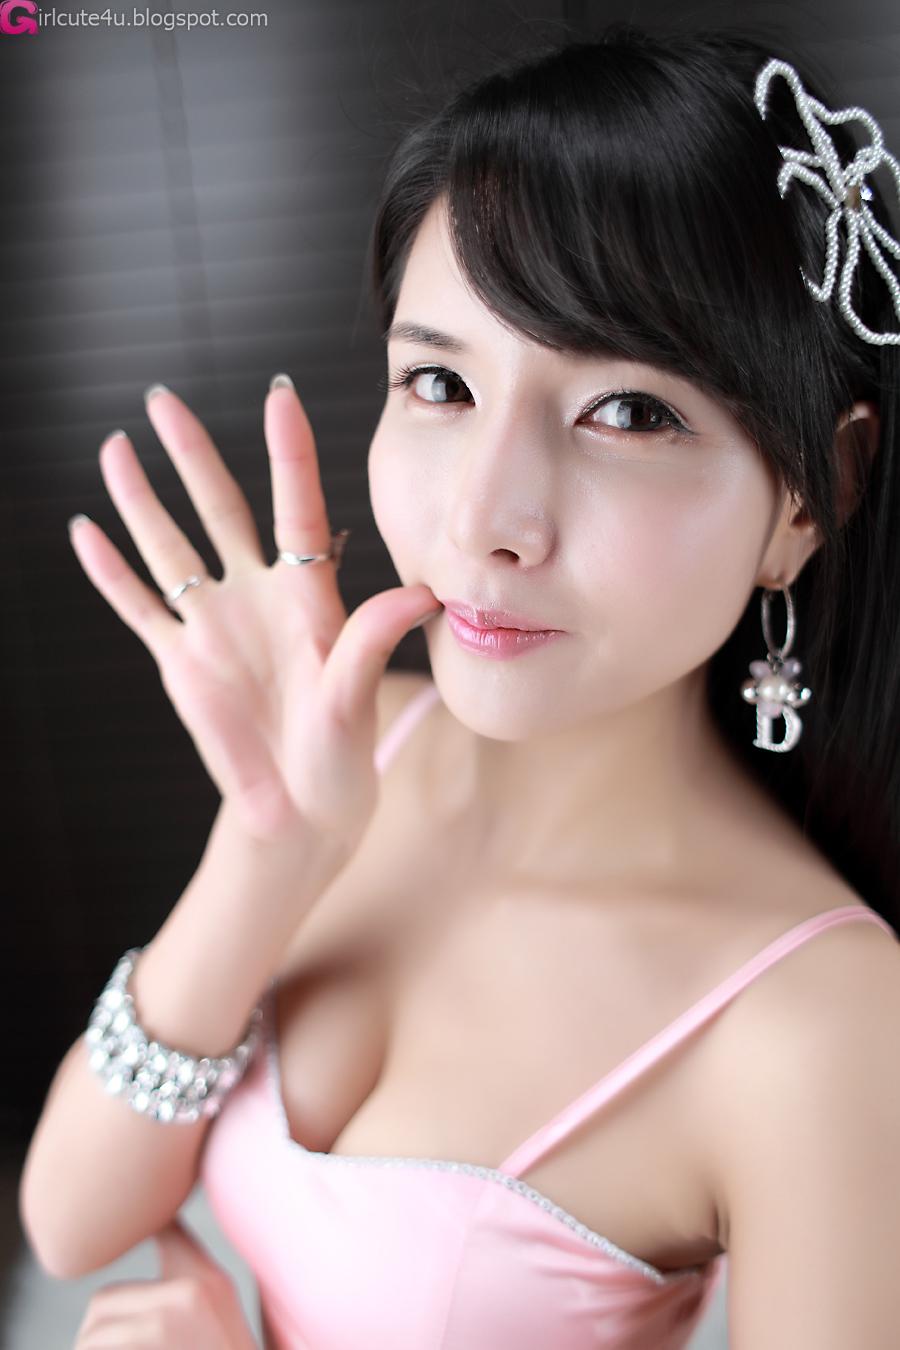 xxx nude girls: Cha Sun Hwa - Gorgeous Pink